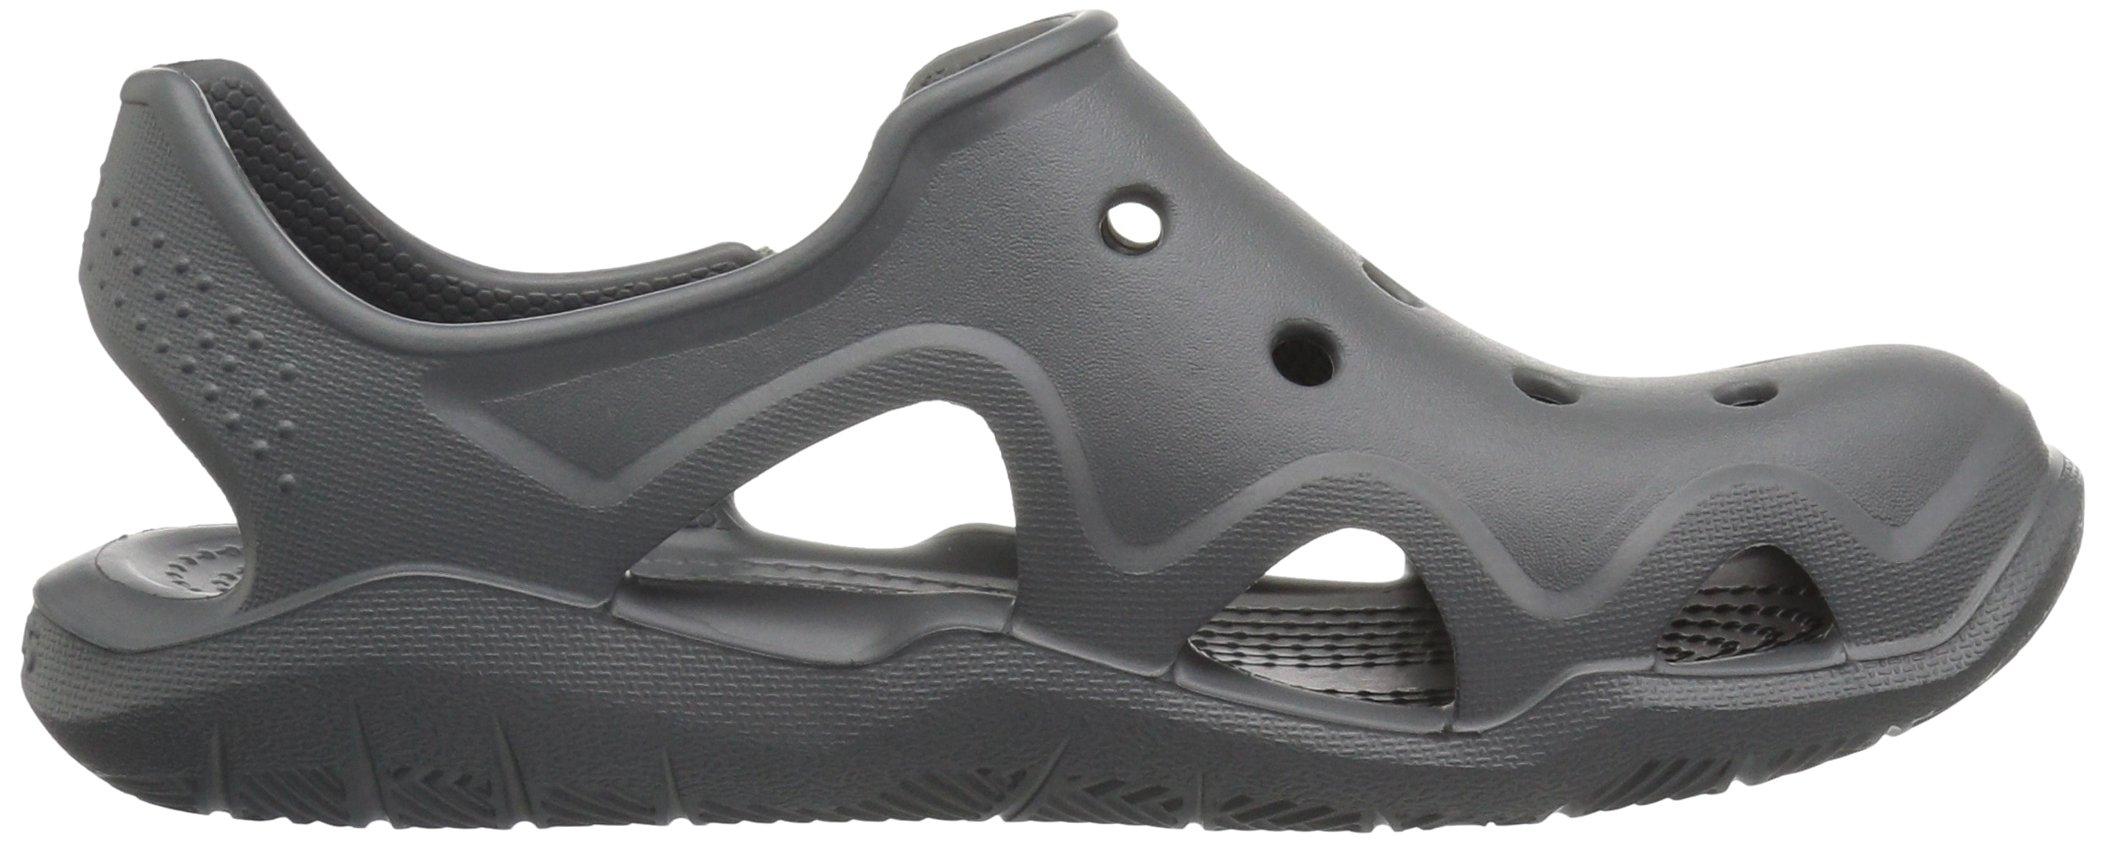 Crocs Unisex-Kids Swiftwater Wave Flat Sandal, Slate Grey/Tennis Ball Green, 13 M US Little Kid by Crocs (Image #7)